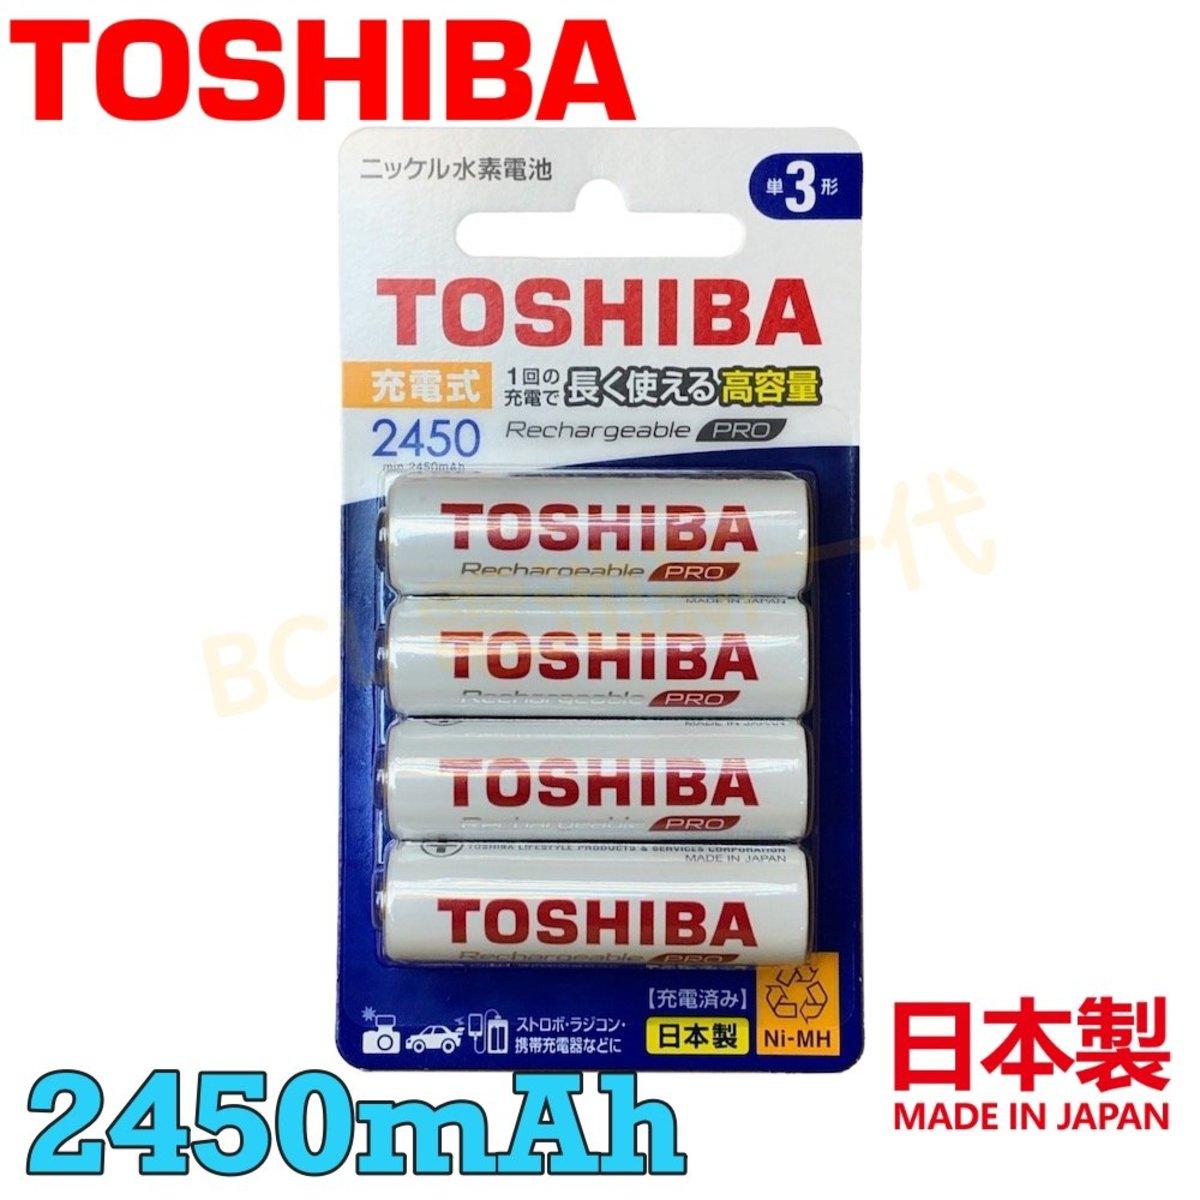 AA/2A Rechargeable Batteries 2450mAh (4 Pack) TNH-6AH 4BP